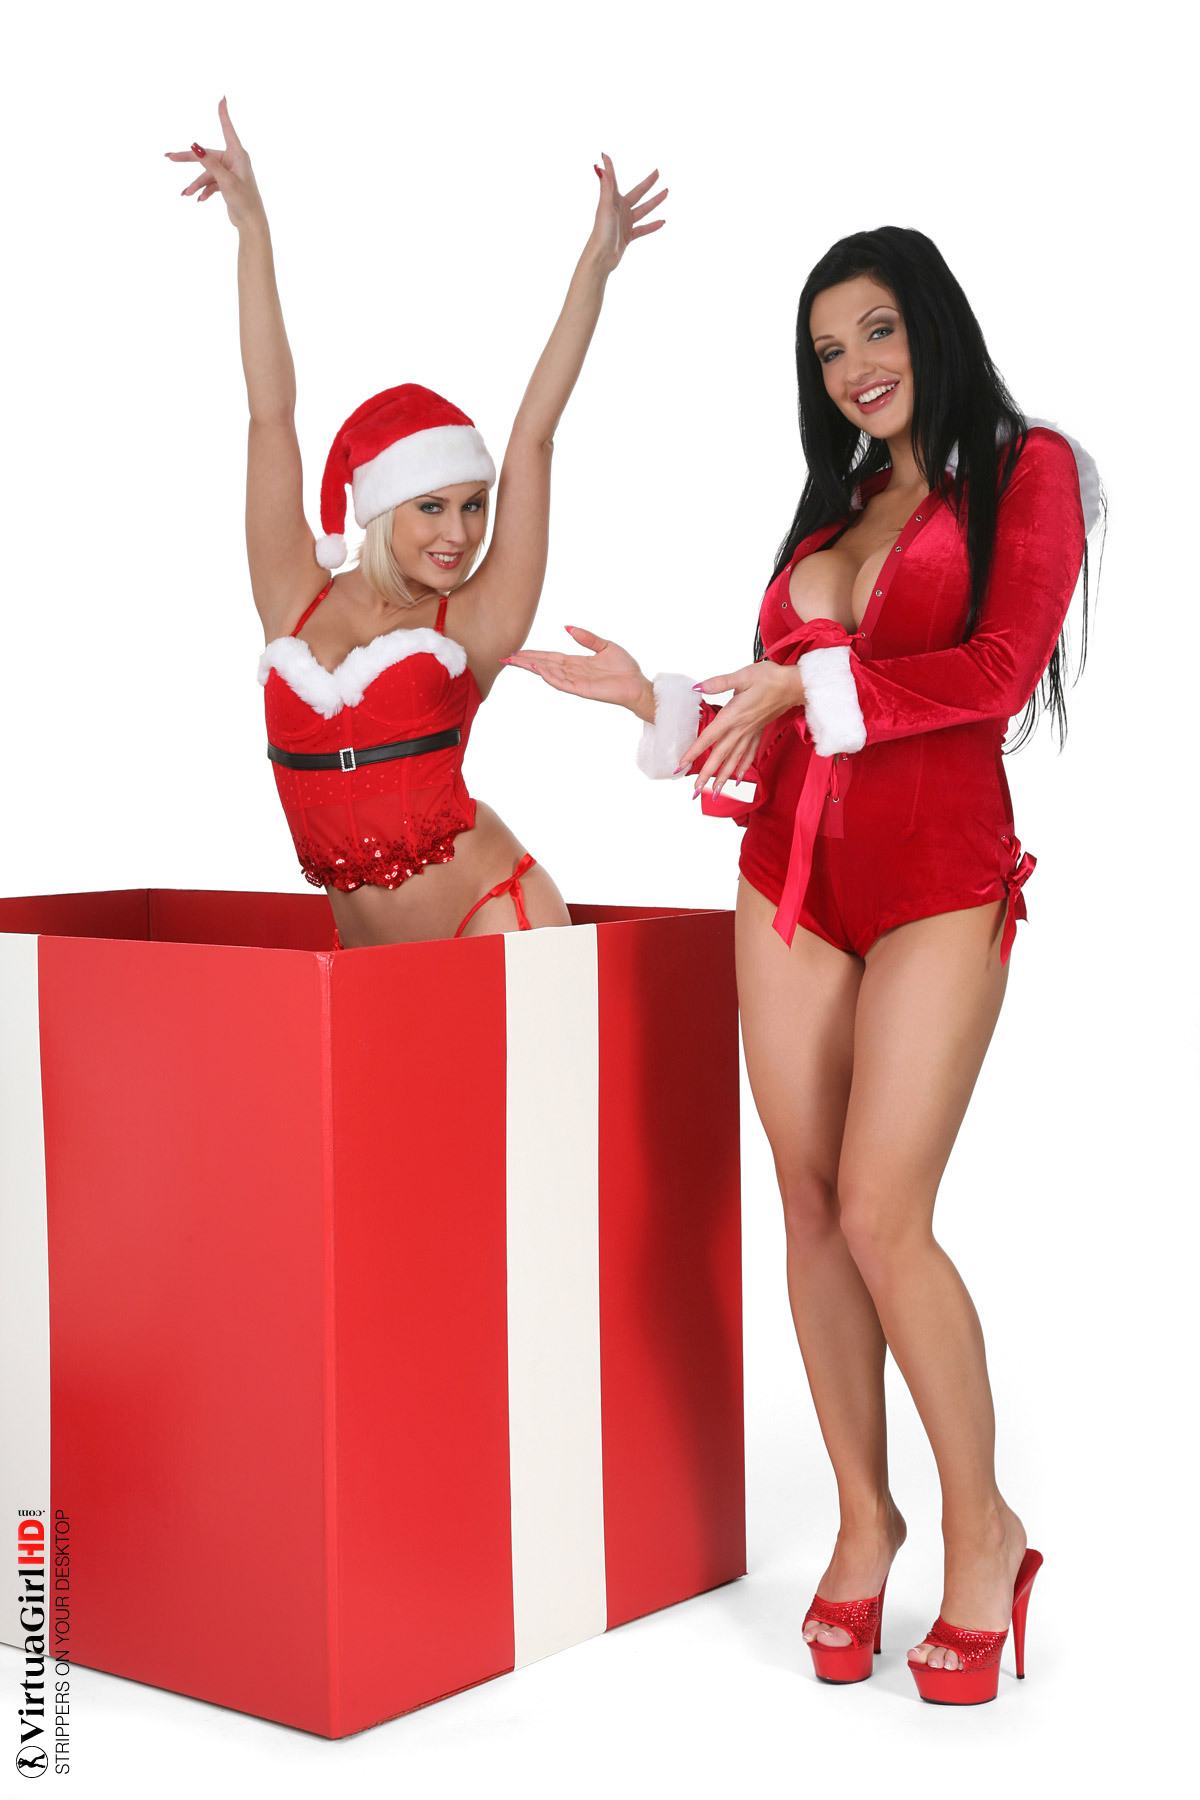 big girls stripping in strip club dance hot